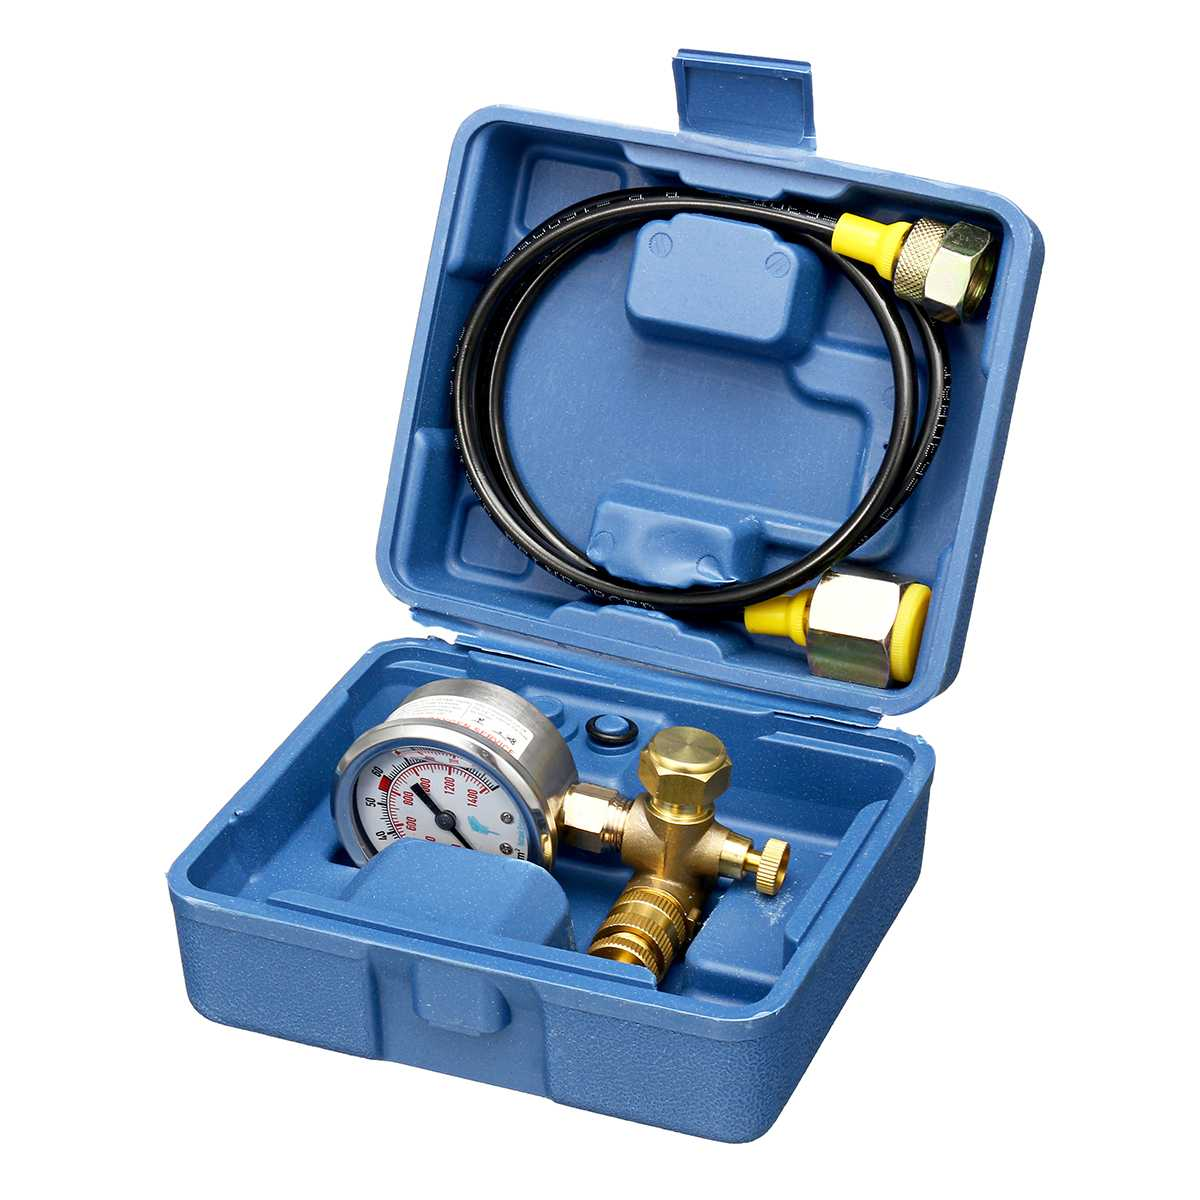 Pressure Gauges Kit Nitrogen Gas Charging Hydraulic Breaker Hammer Device Measurement Accessories For Furukawa Soosan-JY04Pressure Gauges Kit Nitrogen Gas Charging Hydraulic Breaker Hammer Device Measurement Accessories For Furukawa Soosan-JY04